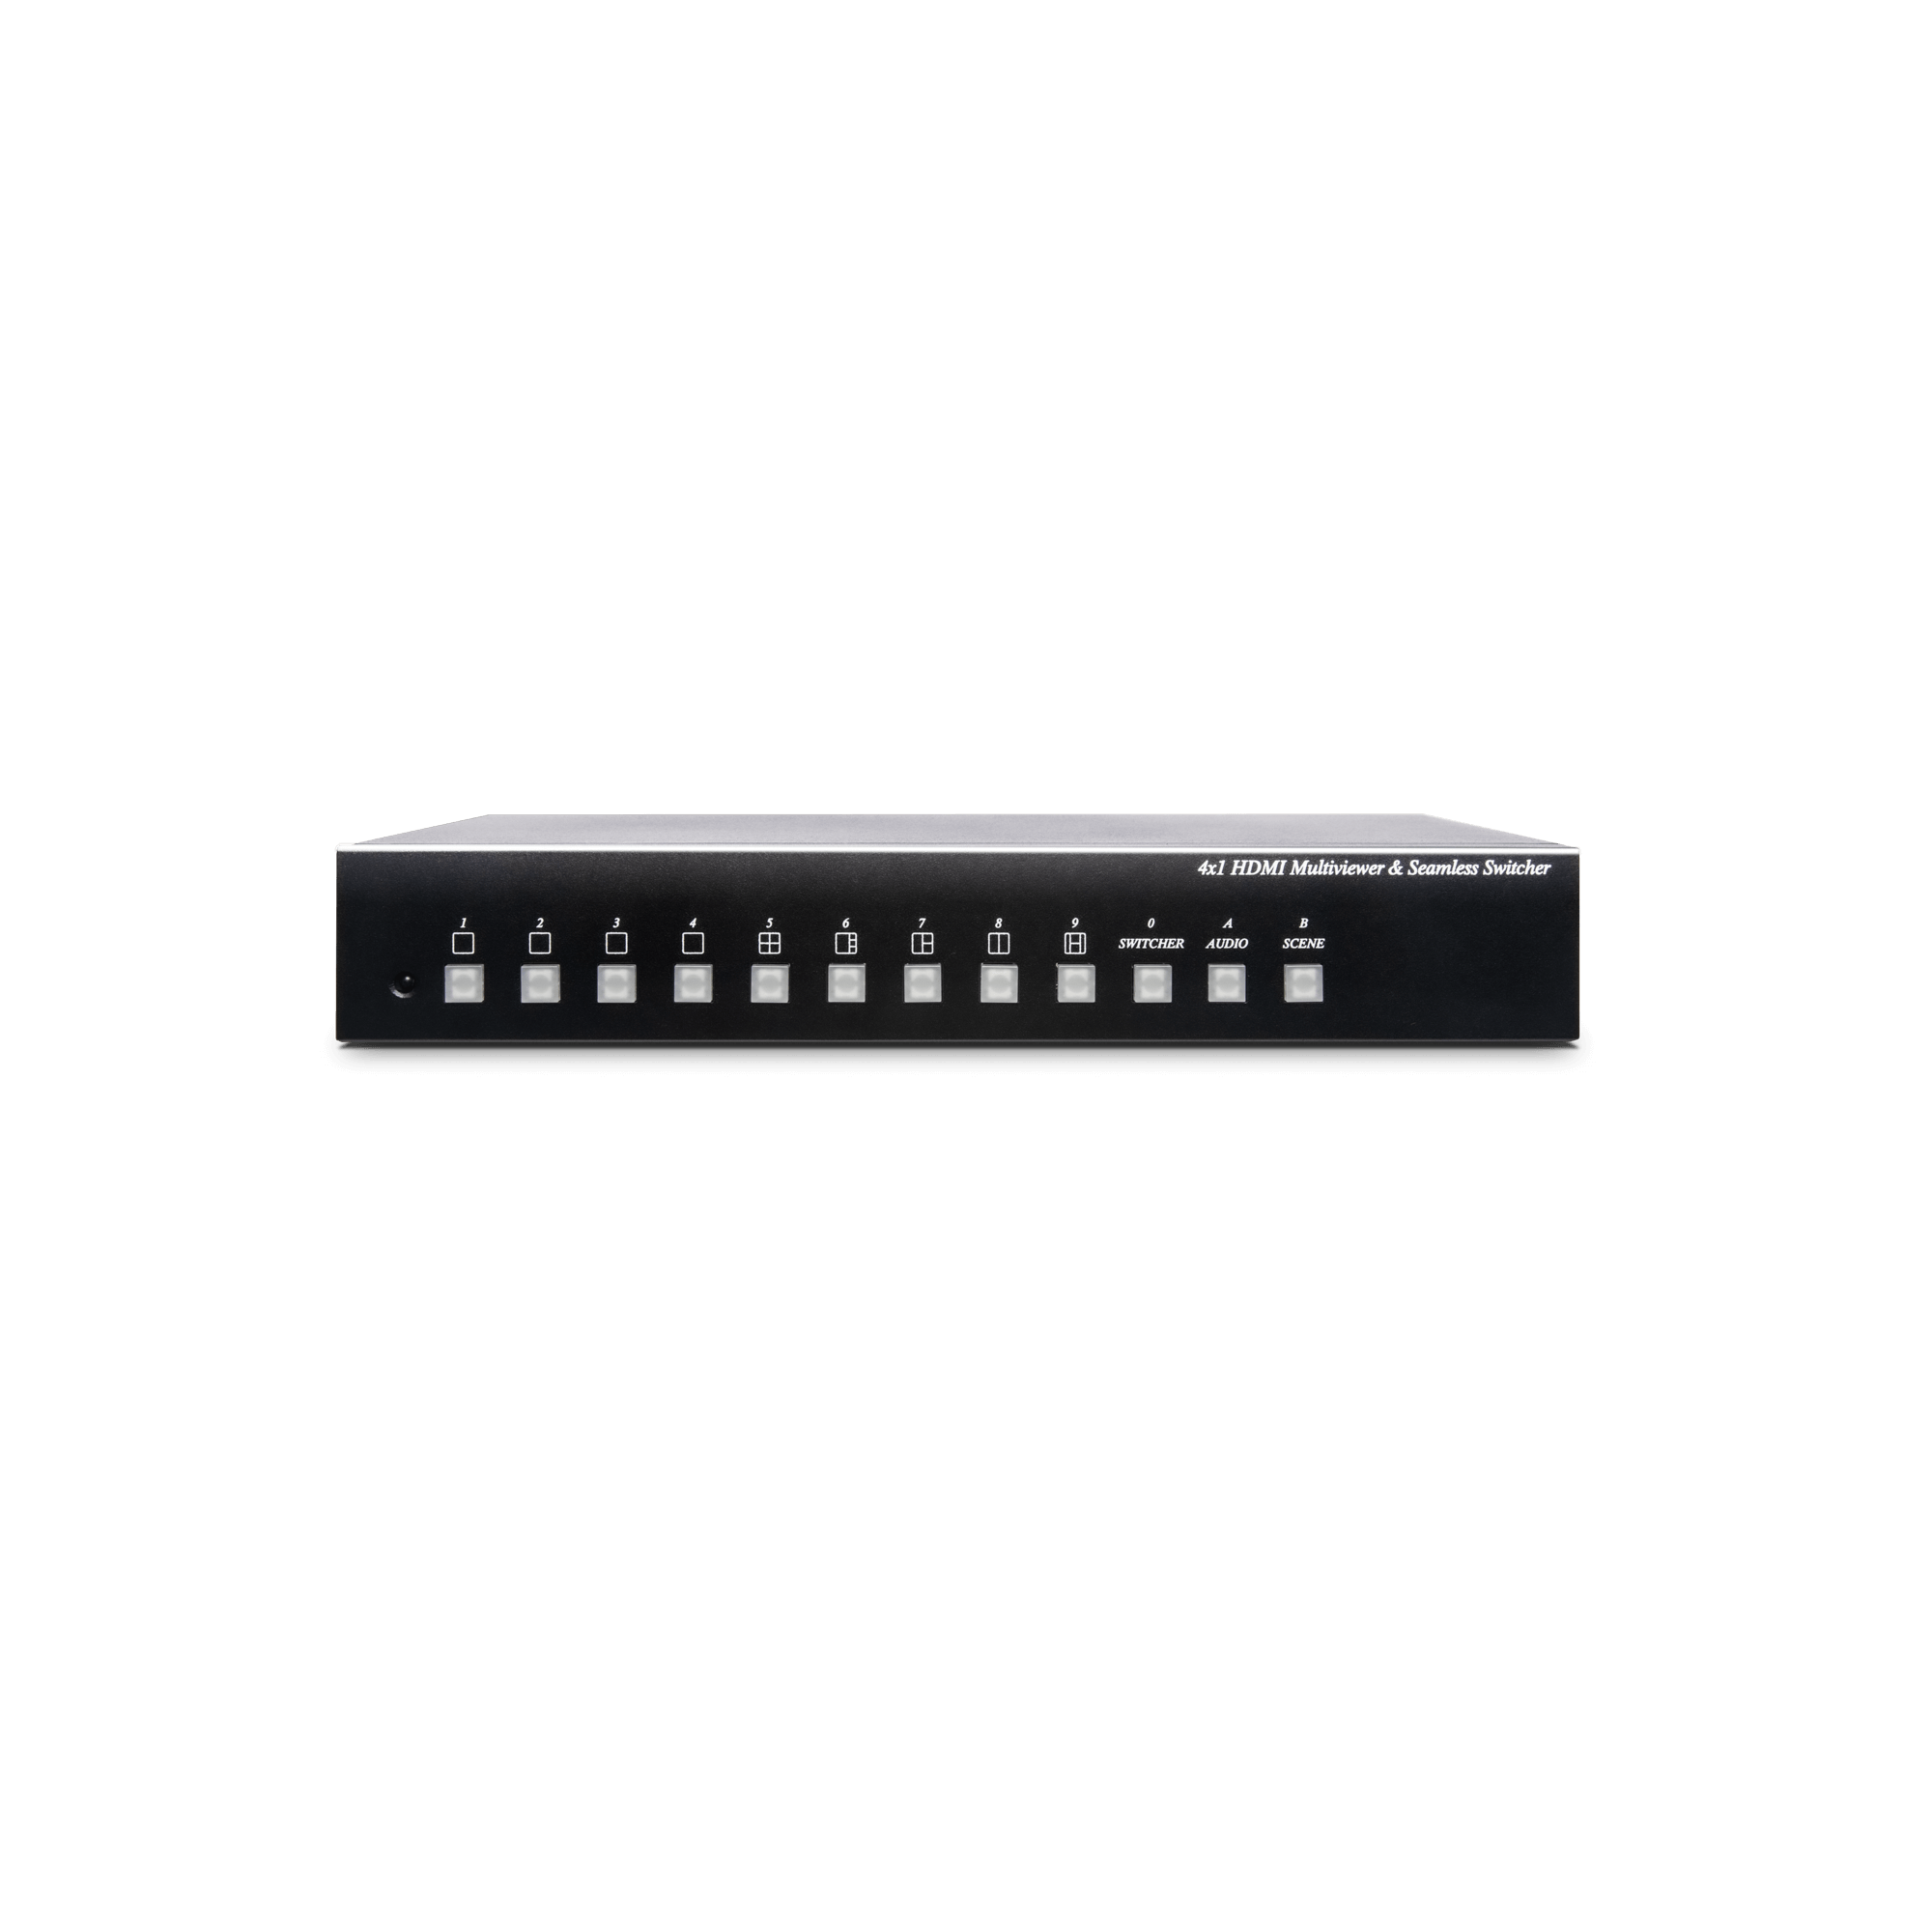 4 x 1 HDMI Seamless Switcher & Multiviewer